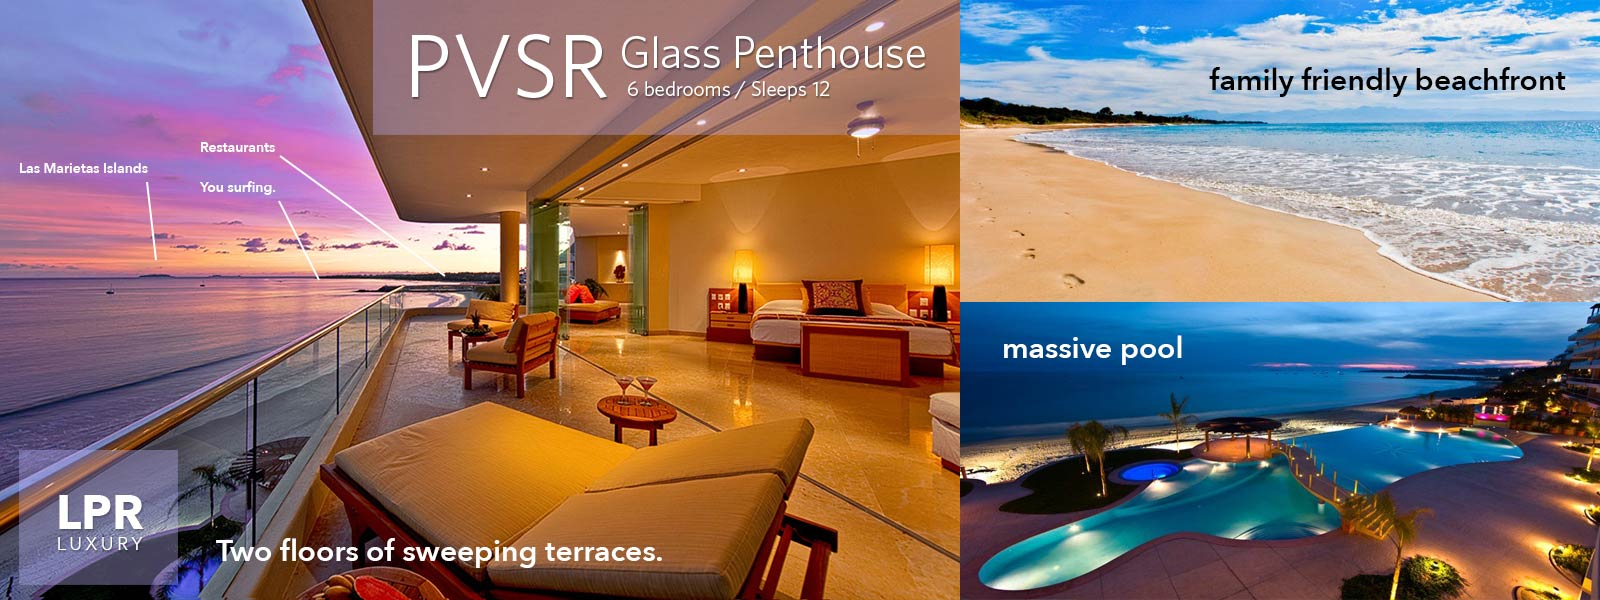 The Glass Penthouse - Playa Punta de Mita, Mexico